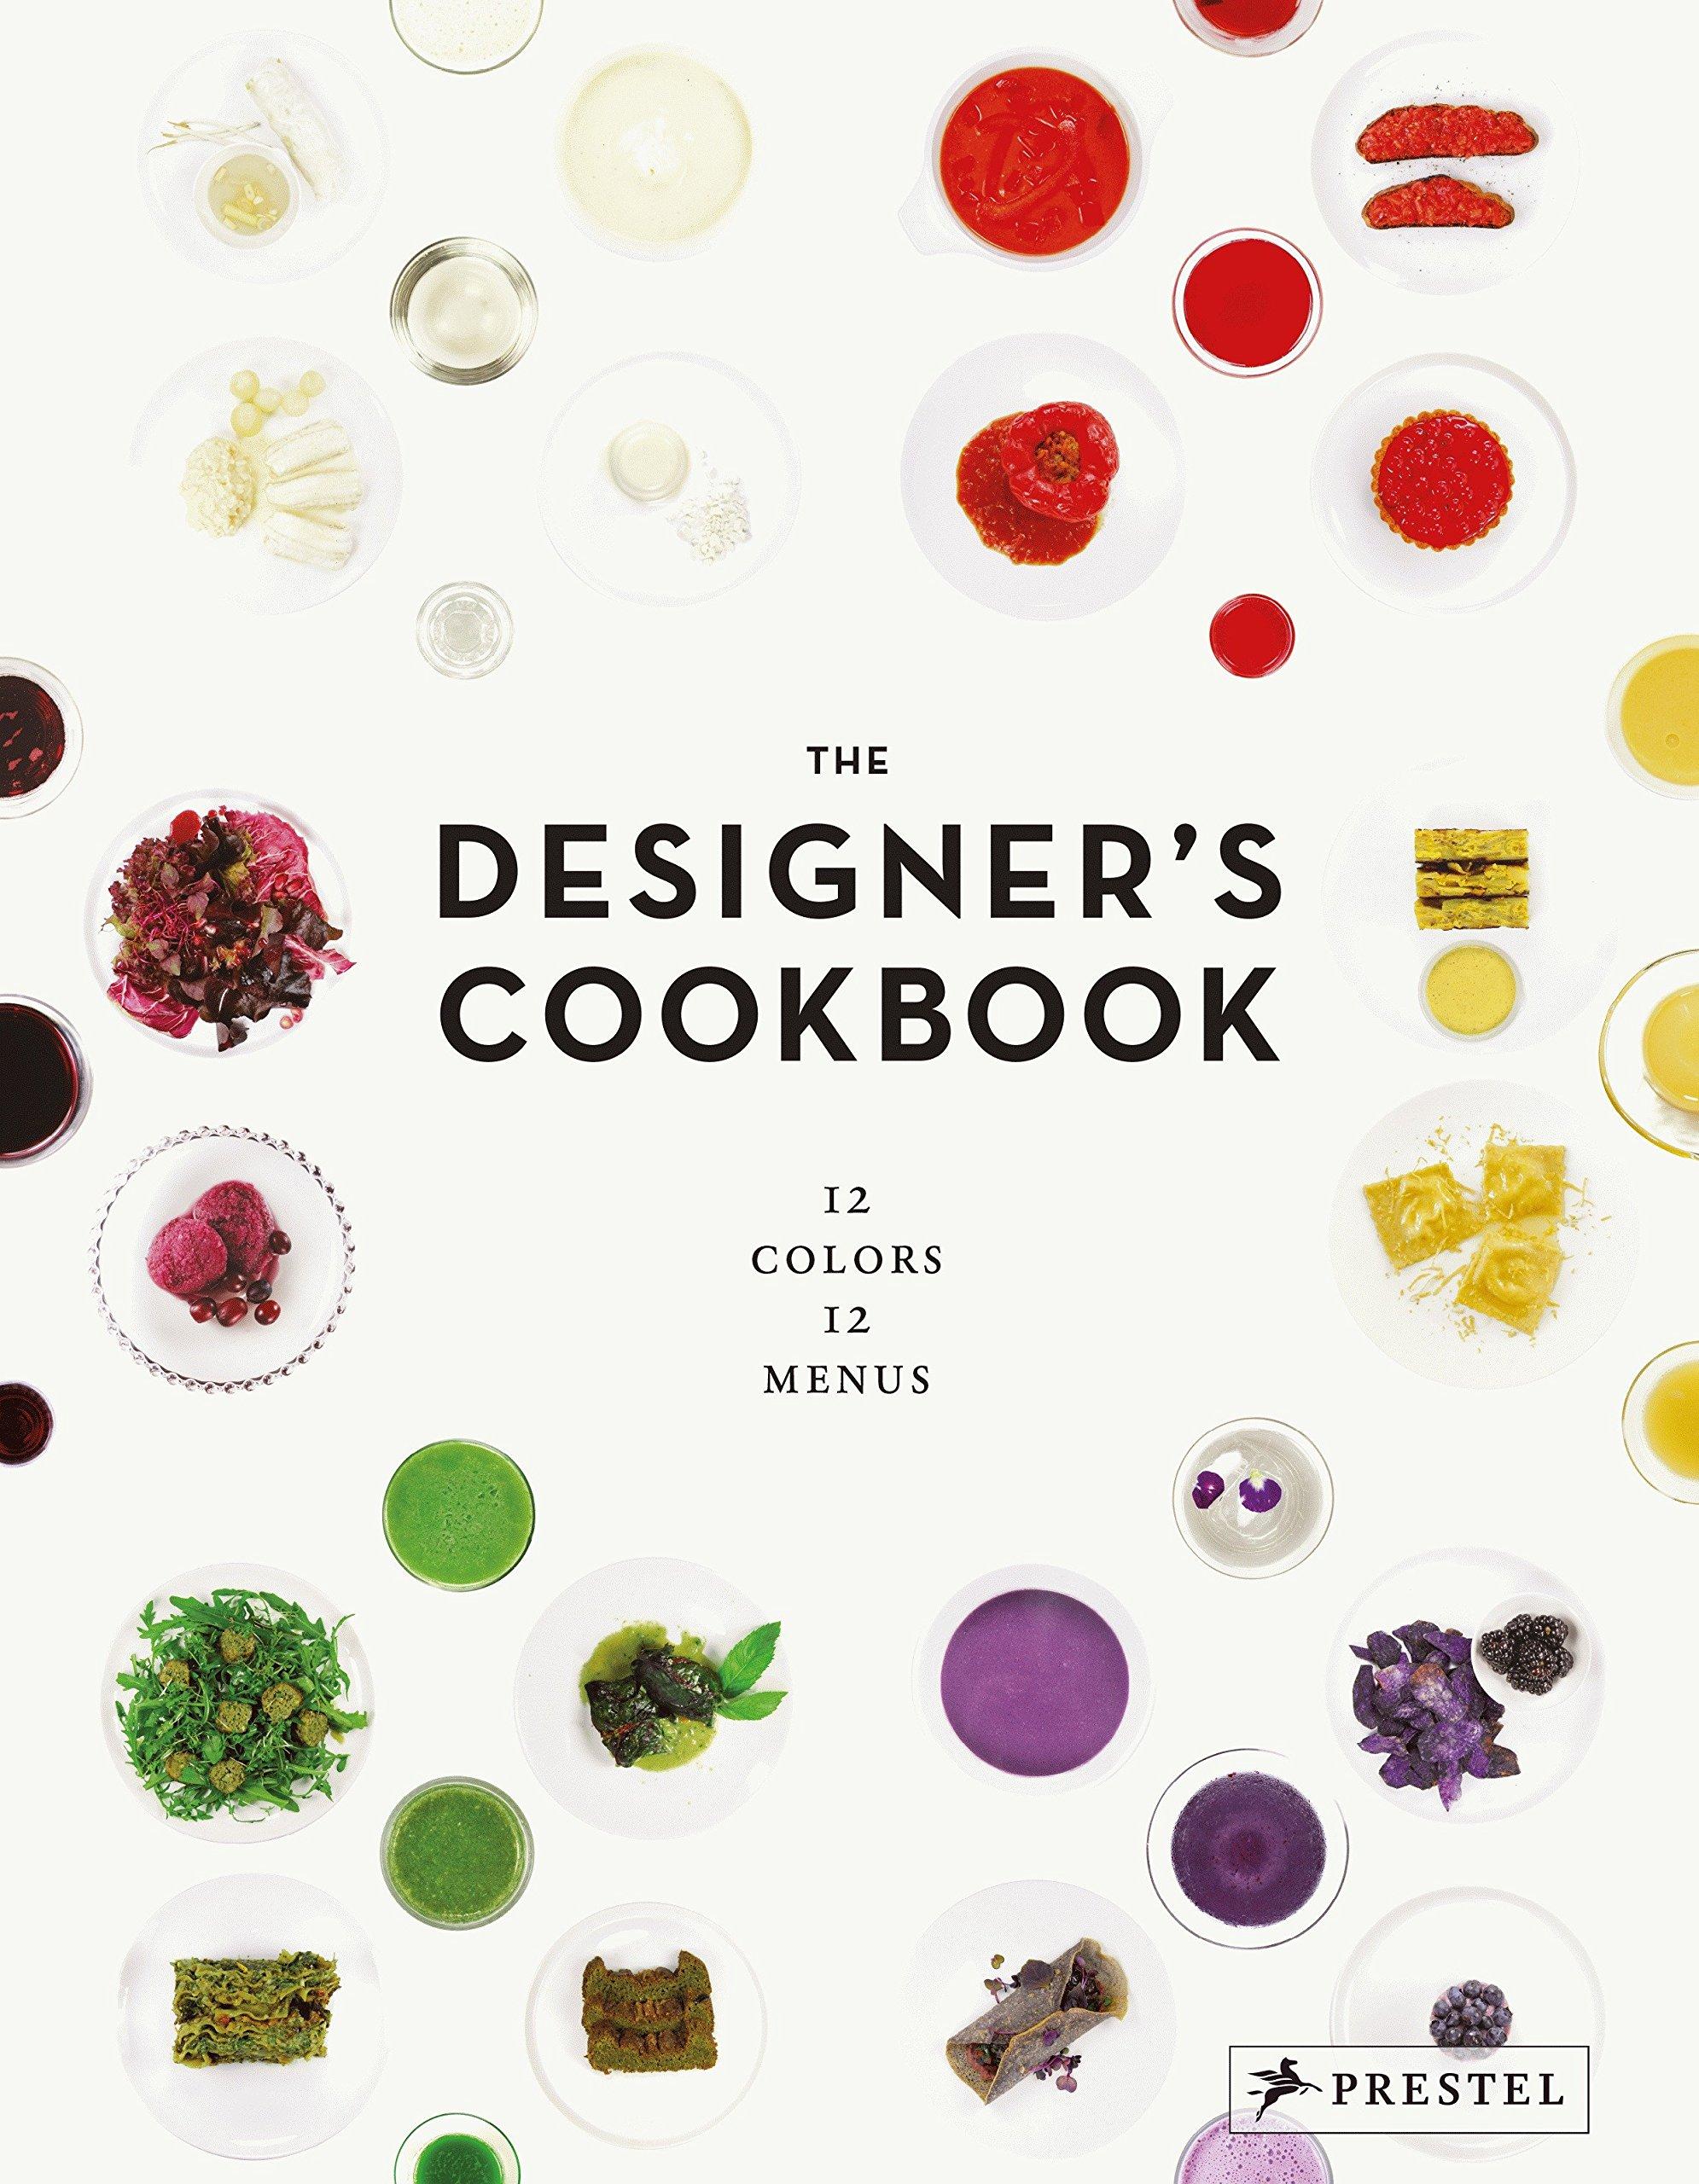 The Designer's Cookbook: 12 Colors, 12 Menus by Reimann Tatjana